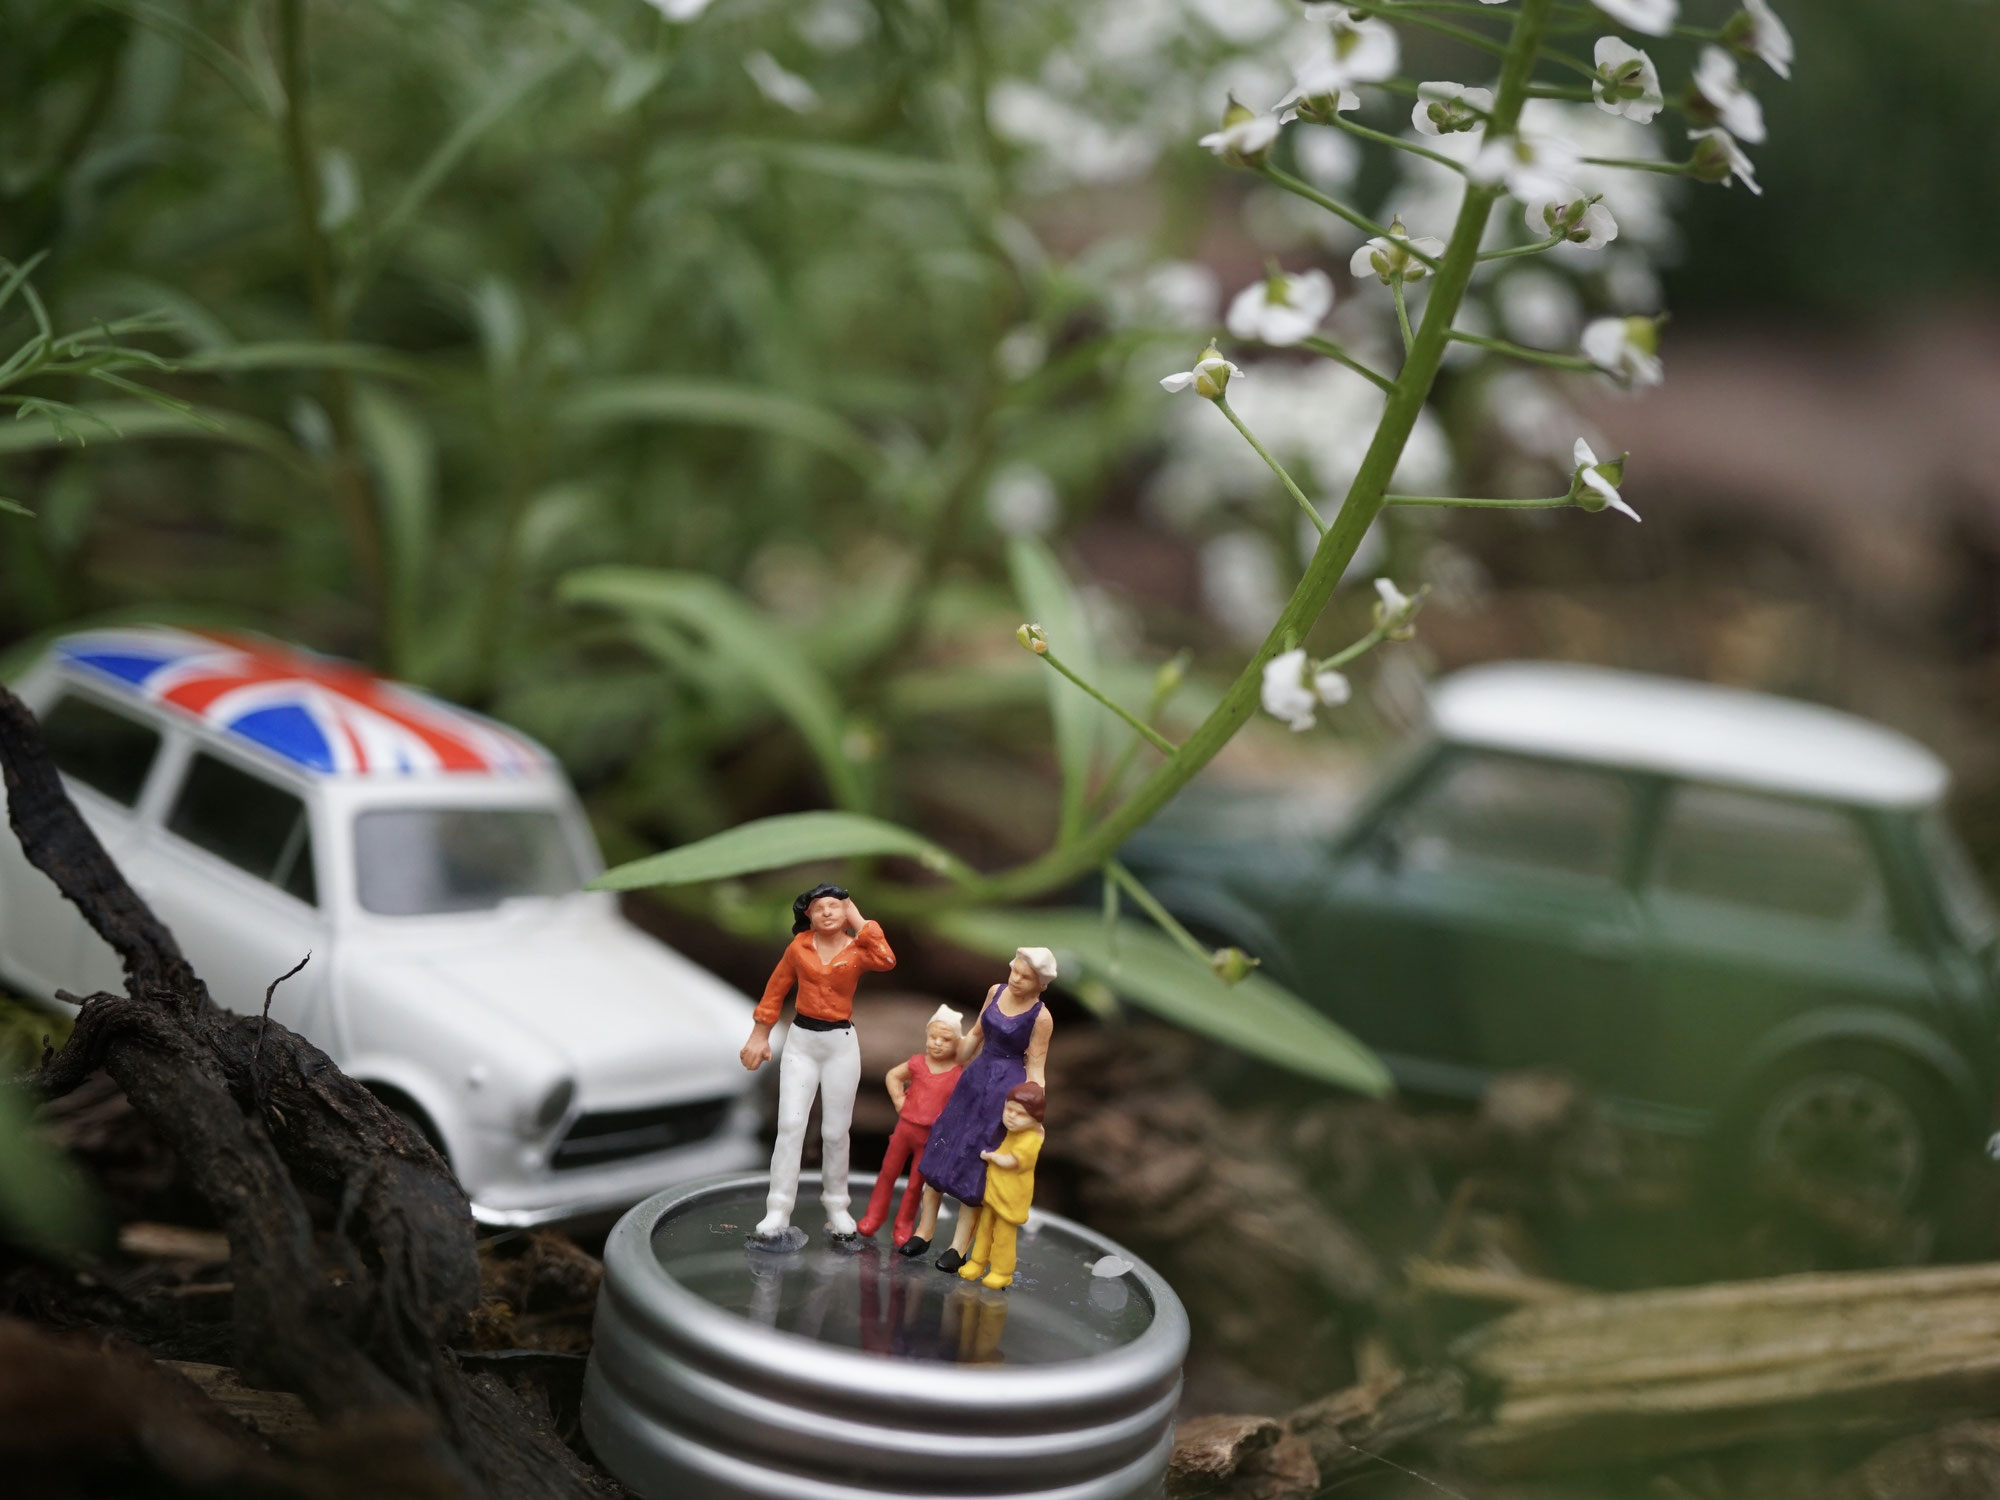 Urlaubsplanung als Regenbogenfamilie